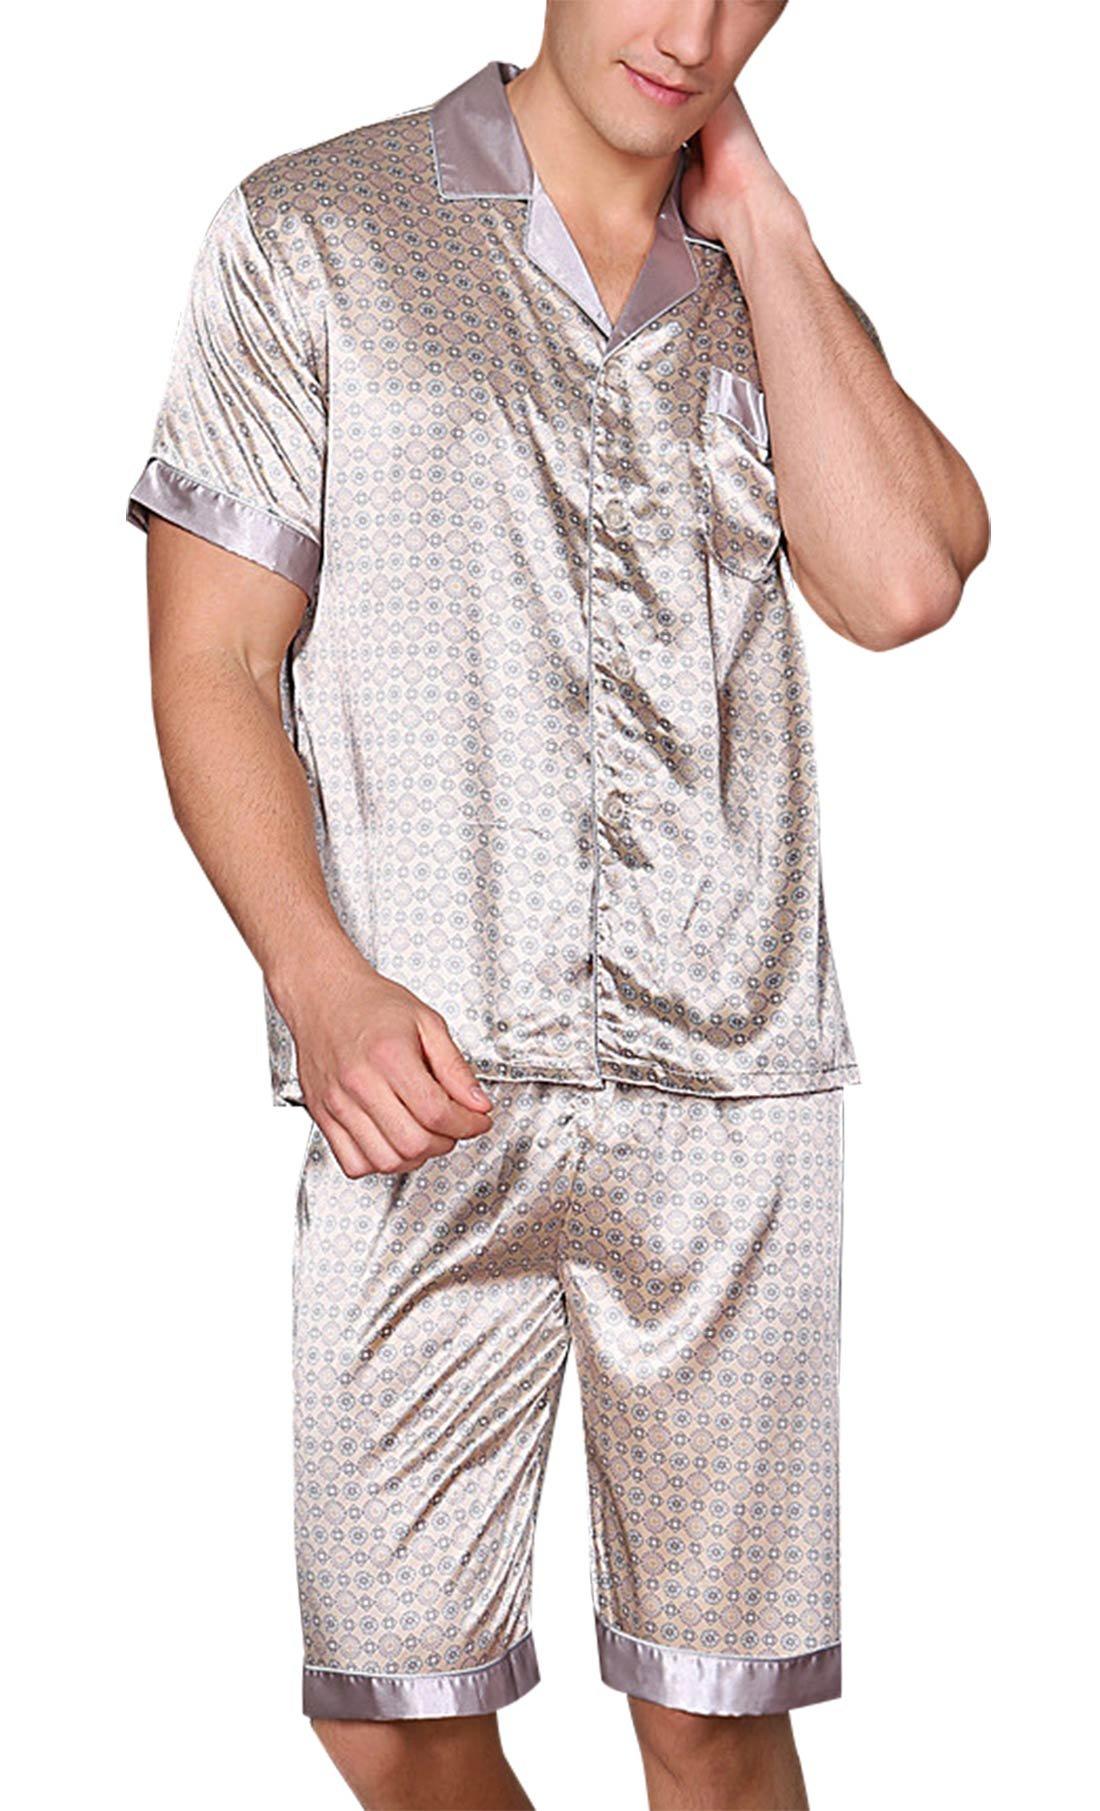 Yanqinger Men's Luxurious Summer Sleepwear Silk Pajamas Set with Shorts Soft Polyester Short Sleeve Loungewear Top & Pants Gray XXL